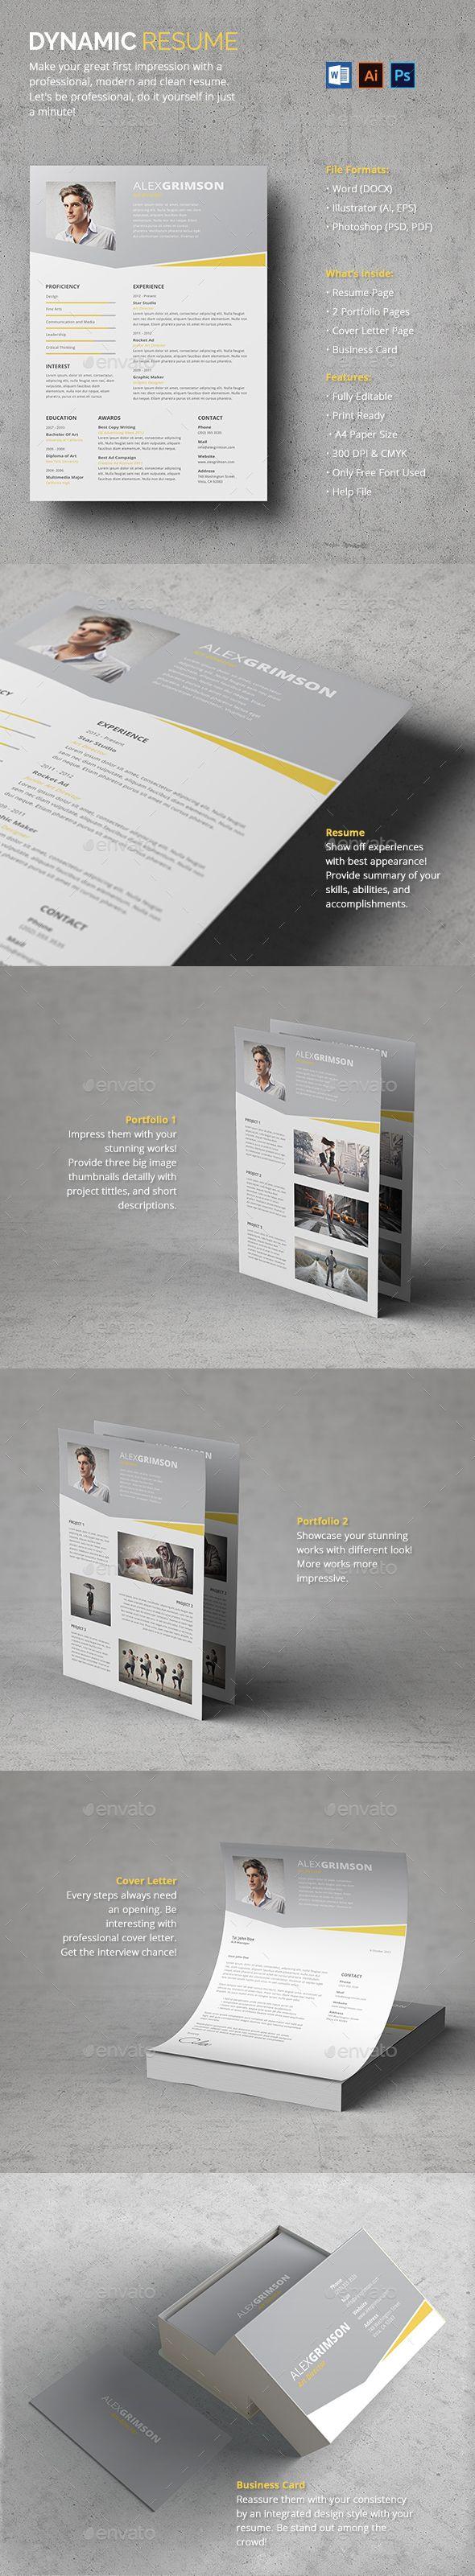 Dynamic Resume Template PSD #design Download: http://graphicriver.net/item/dynamic-resume/13336208?ref=ksioks